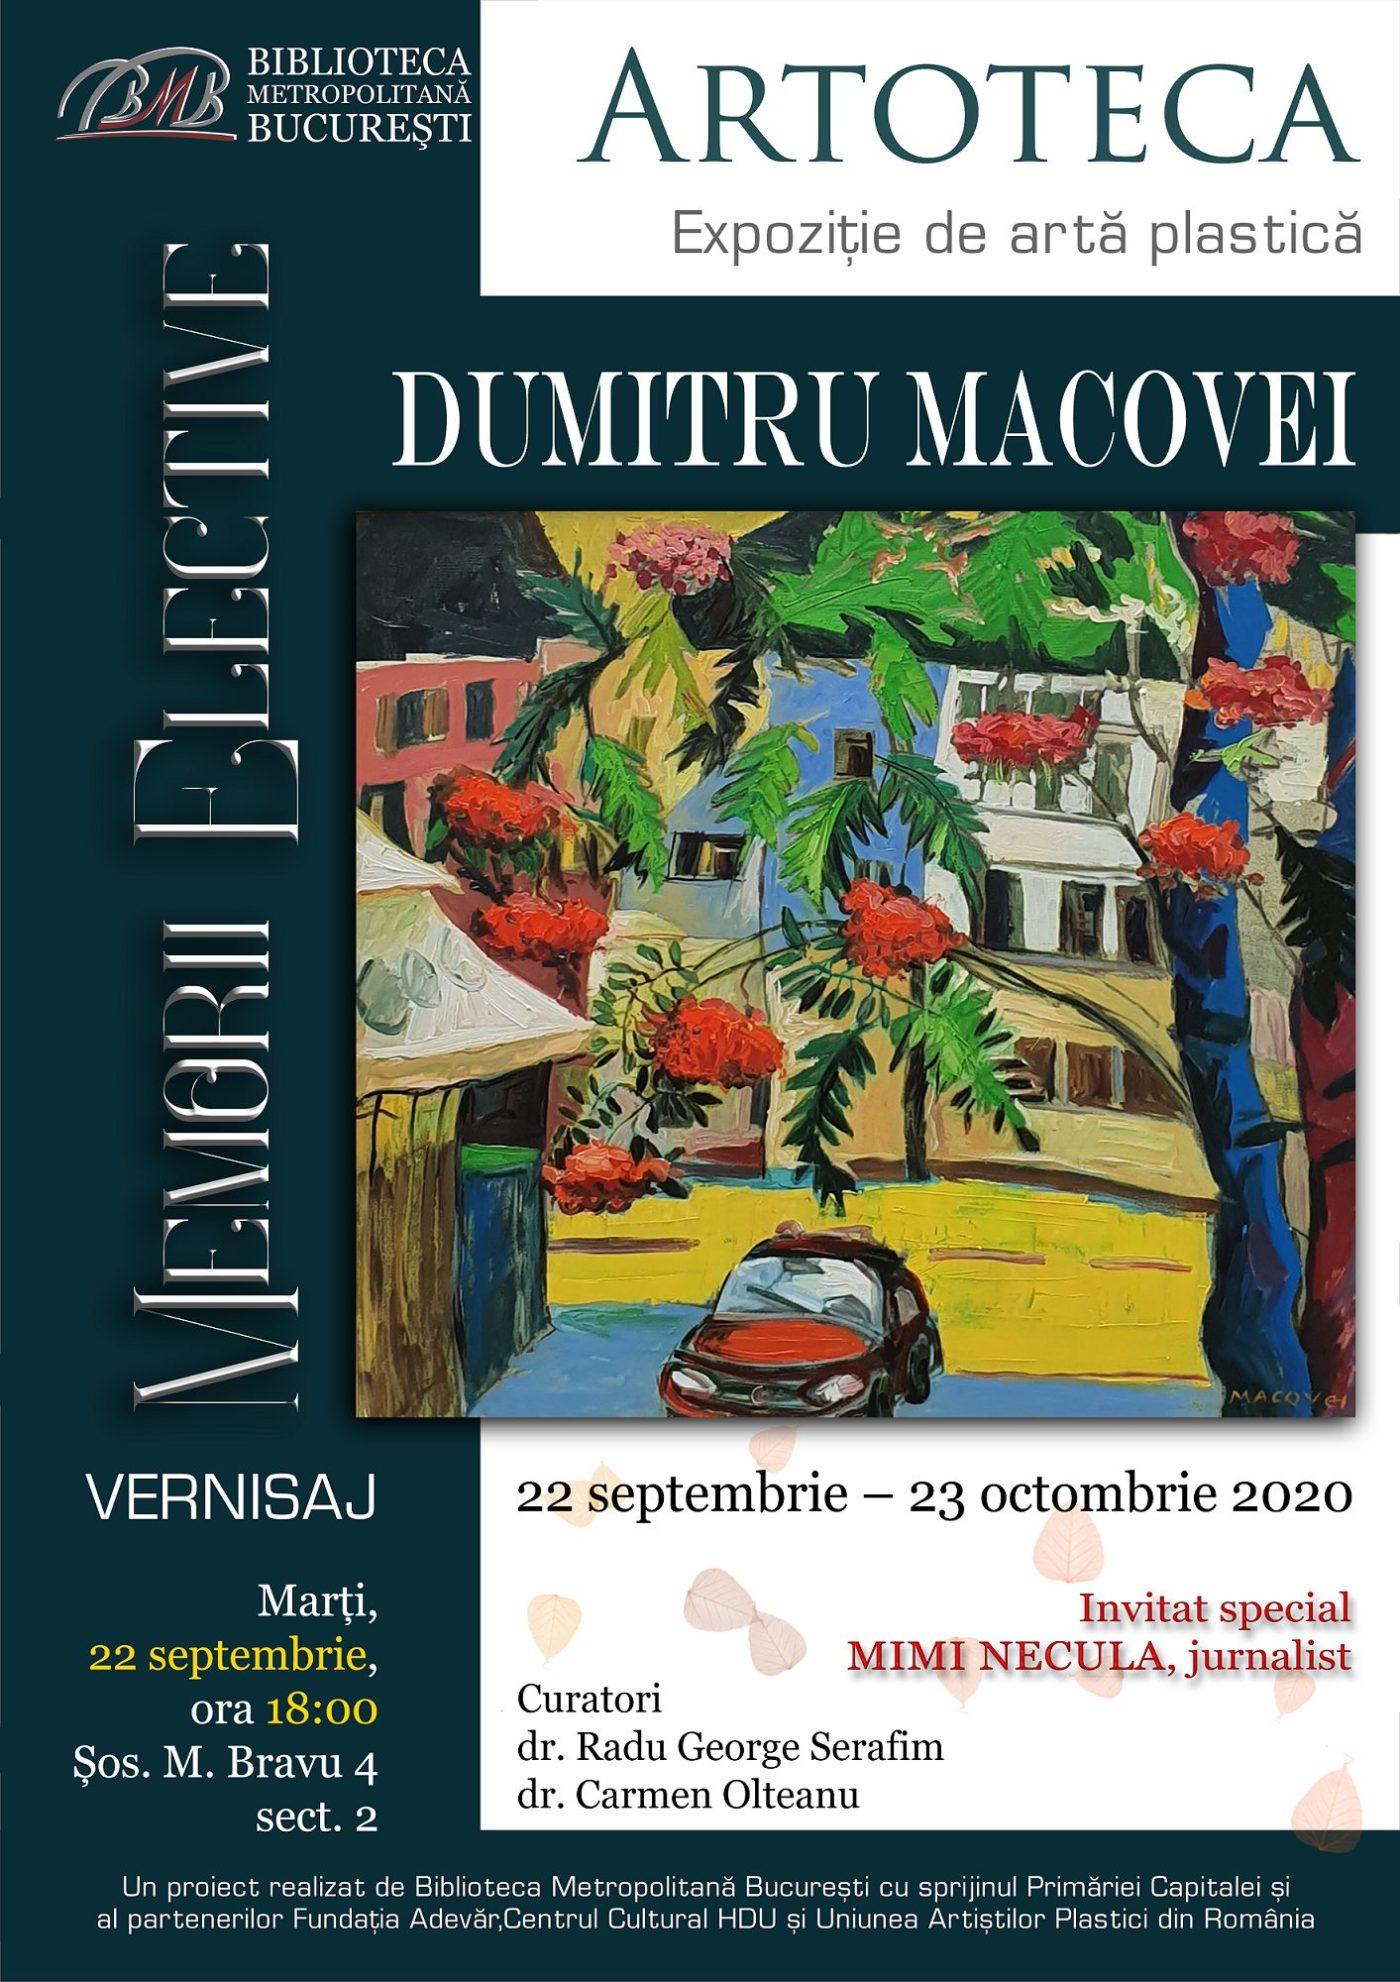 Vernisaj Dumitru Macovei @ Biblioteca Metropolitana Bucuresti